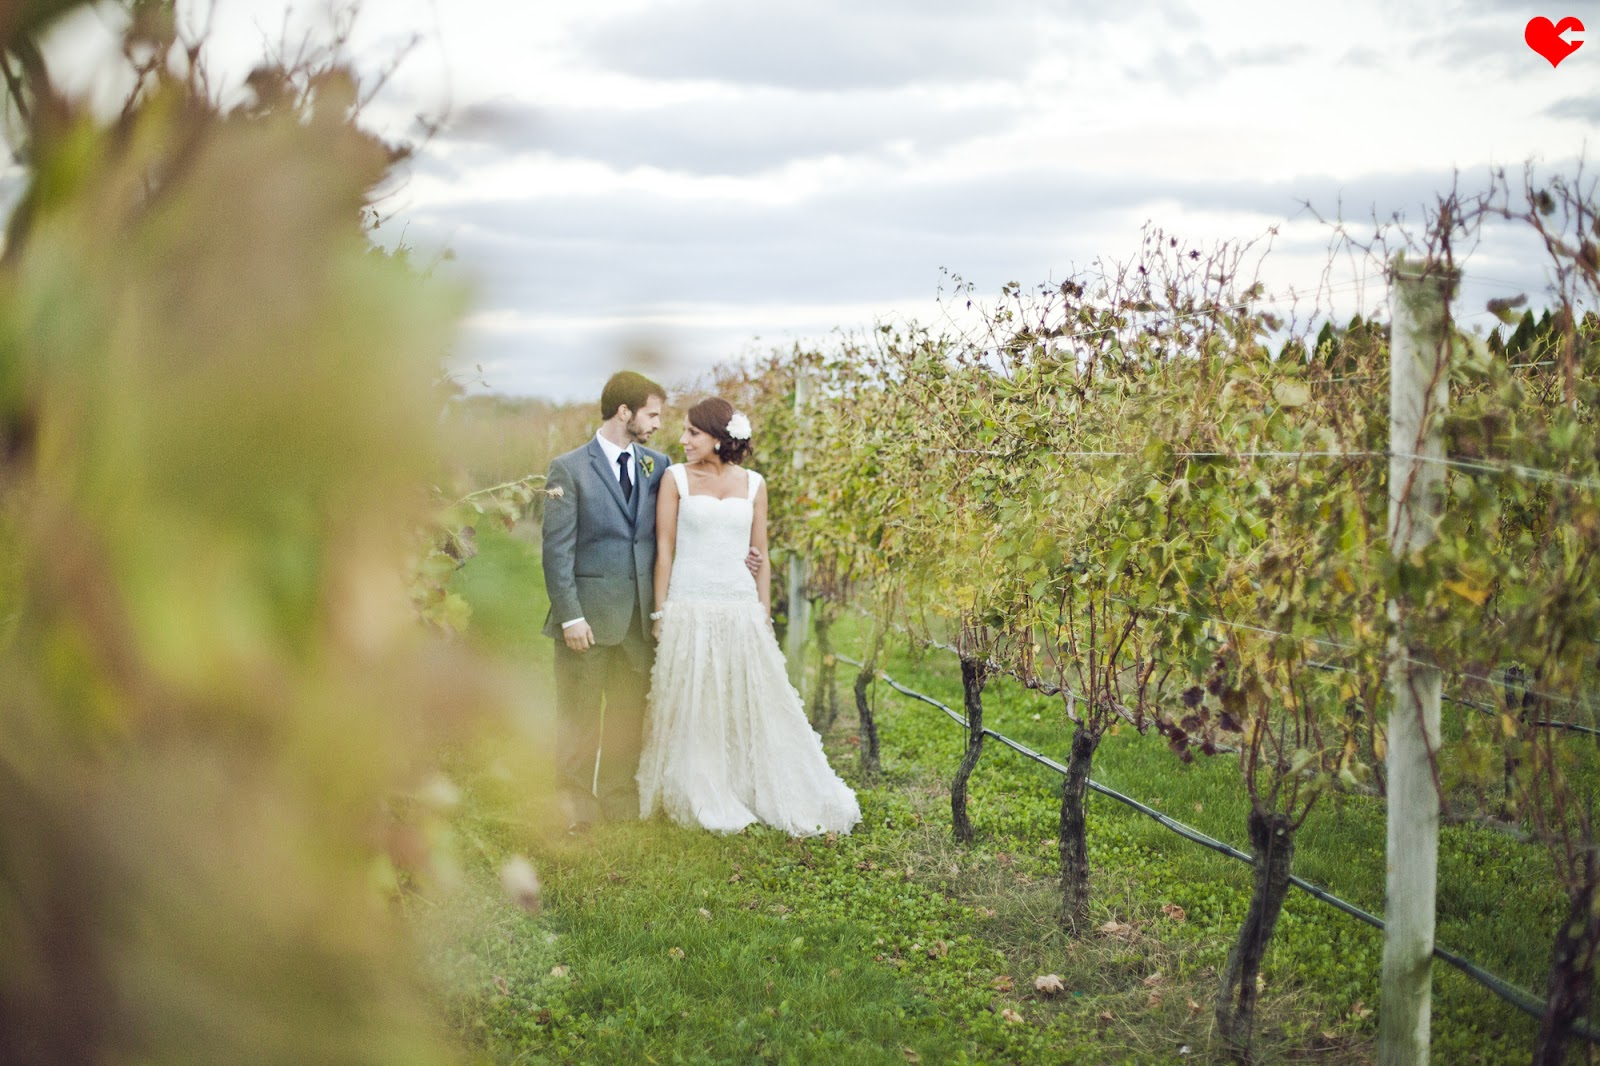 nyc photo blog beimaged photography beblogged martha On martha clara vineyard wedding